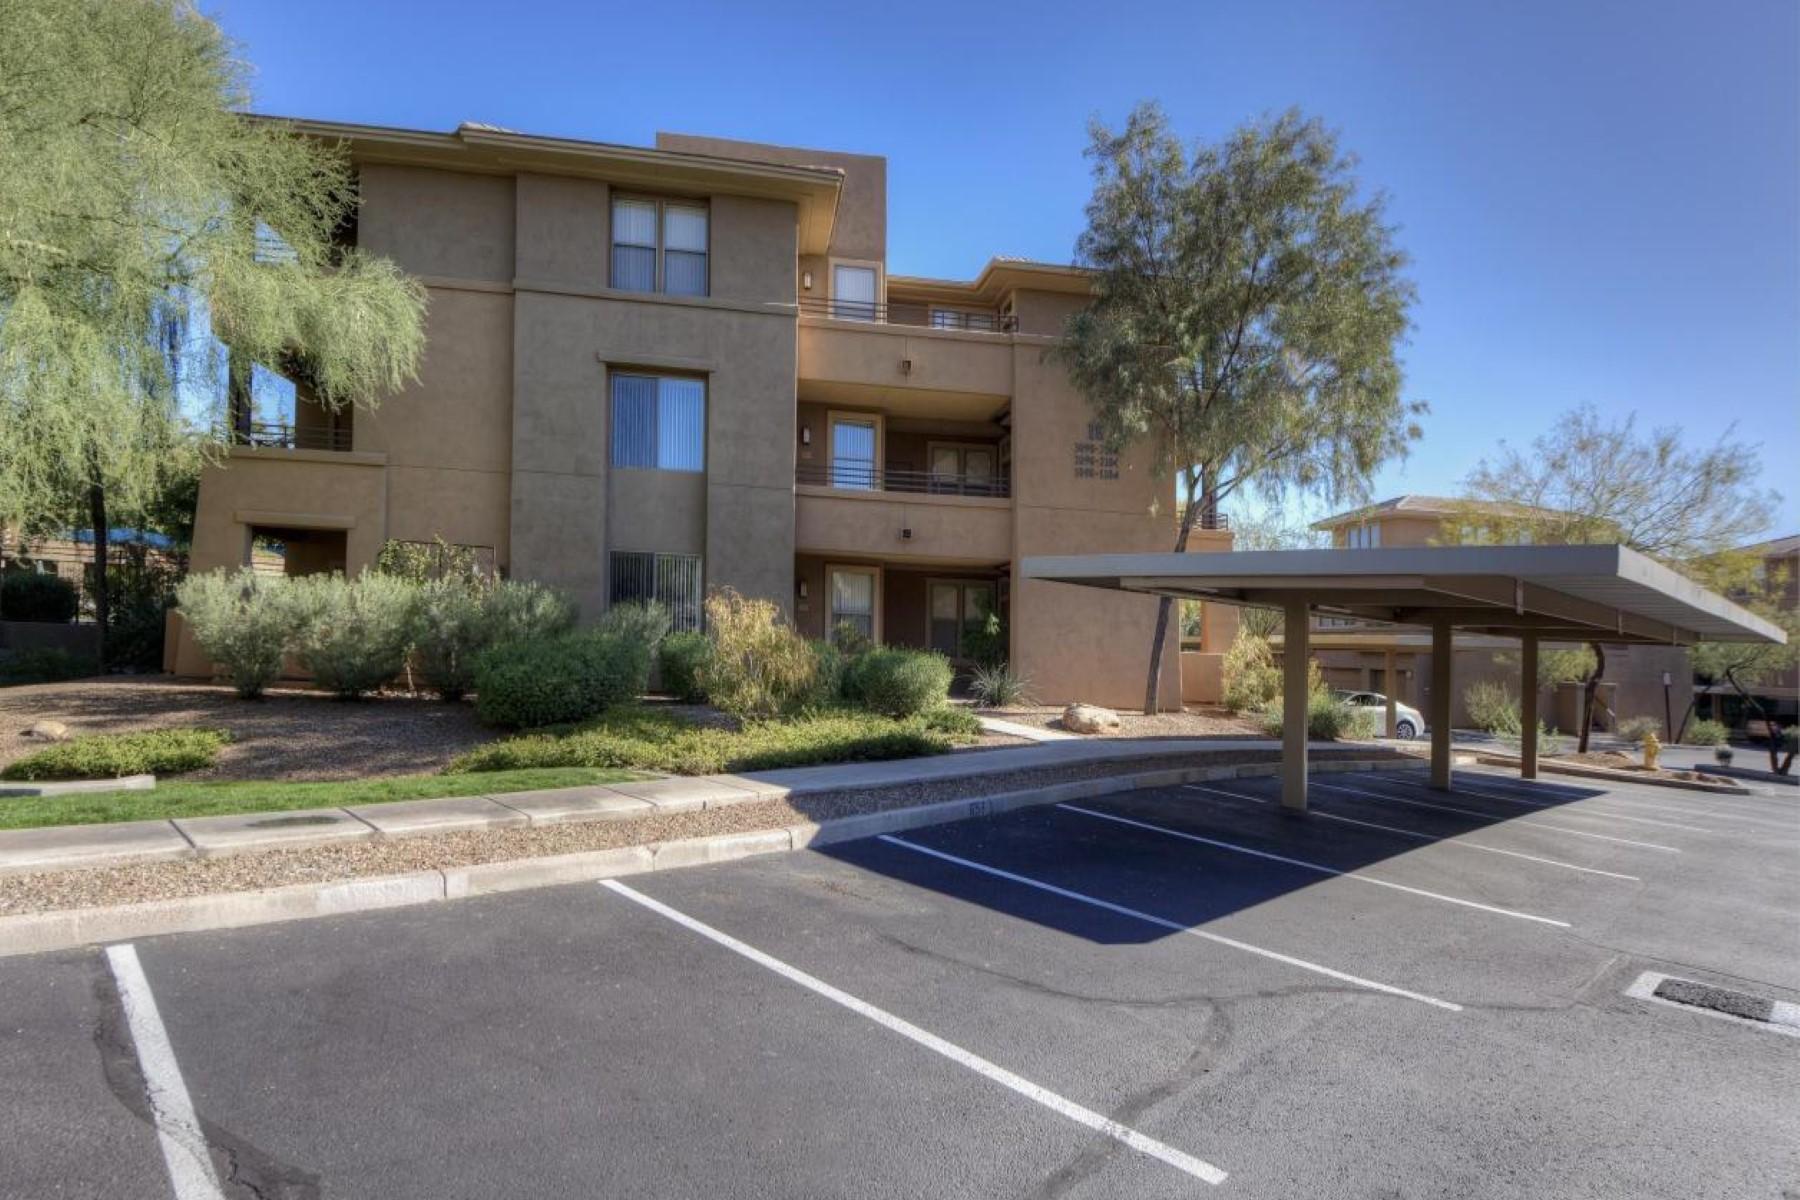 Appartement pour l Vente à Beautifully remodeled unit with great views of the quiet pool 20100 N 78TH PL 2100 Scottsdale, Arizona 85255 États-Unis